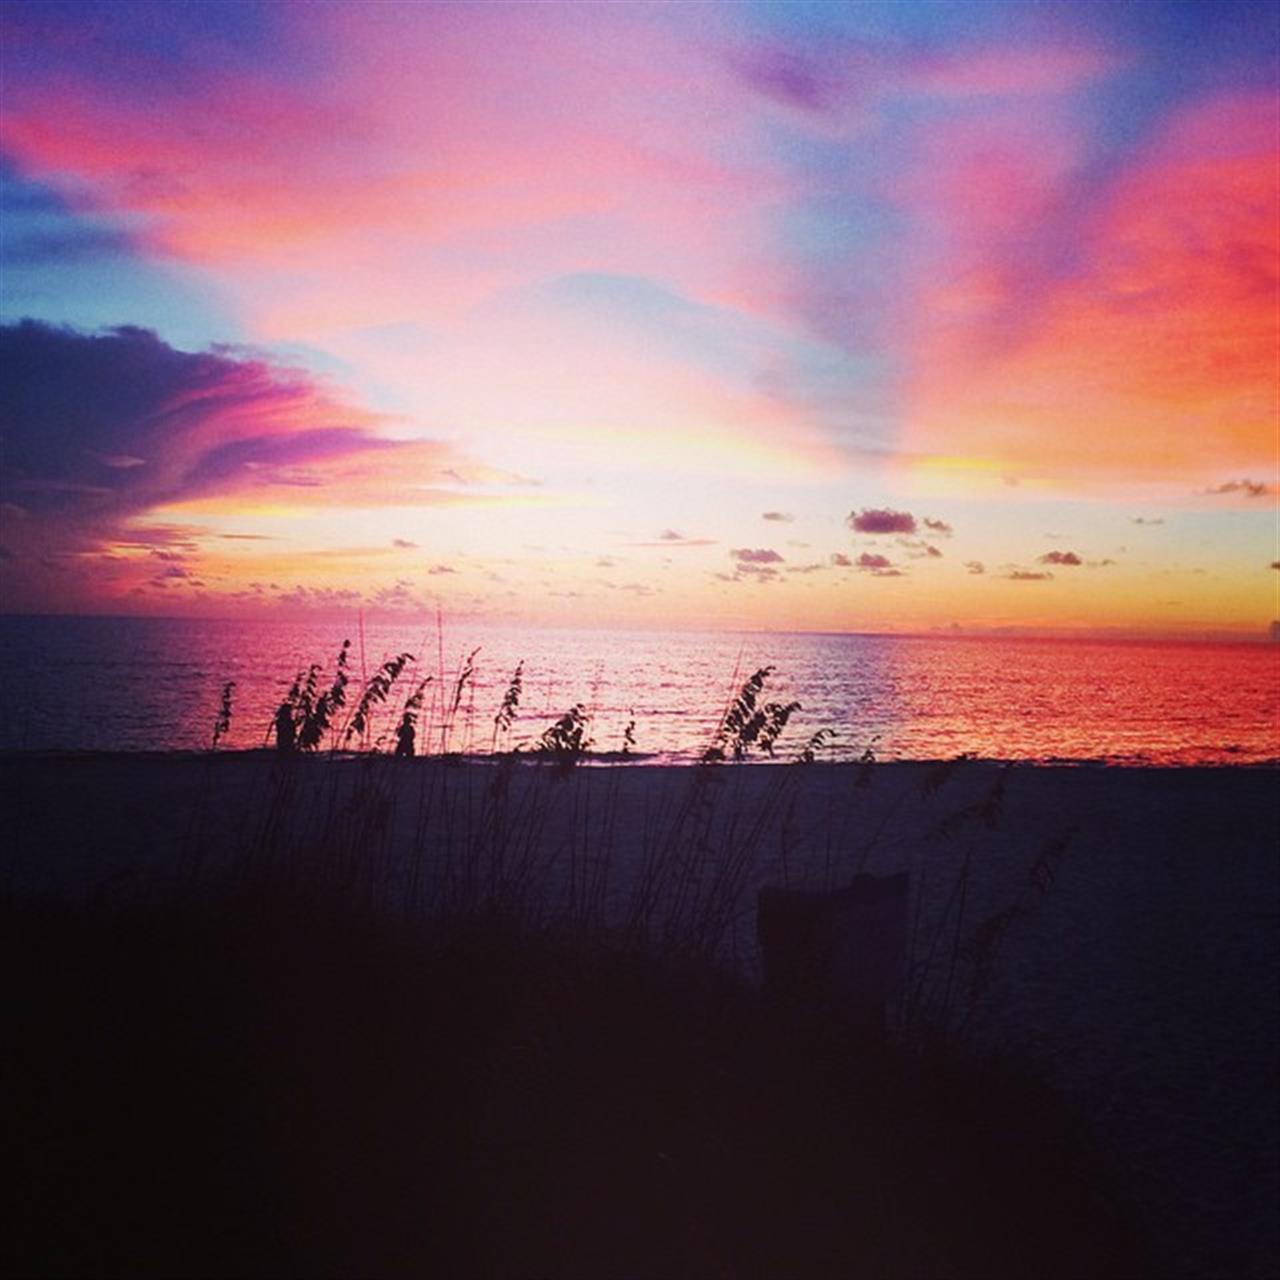 #naplesFL #LeadingRElocal #sunset